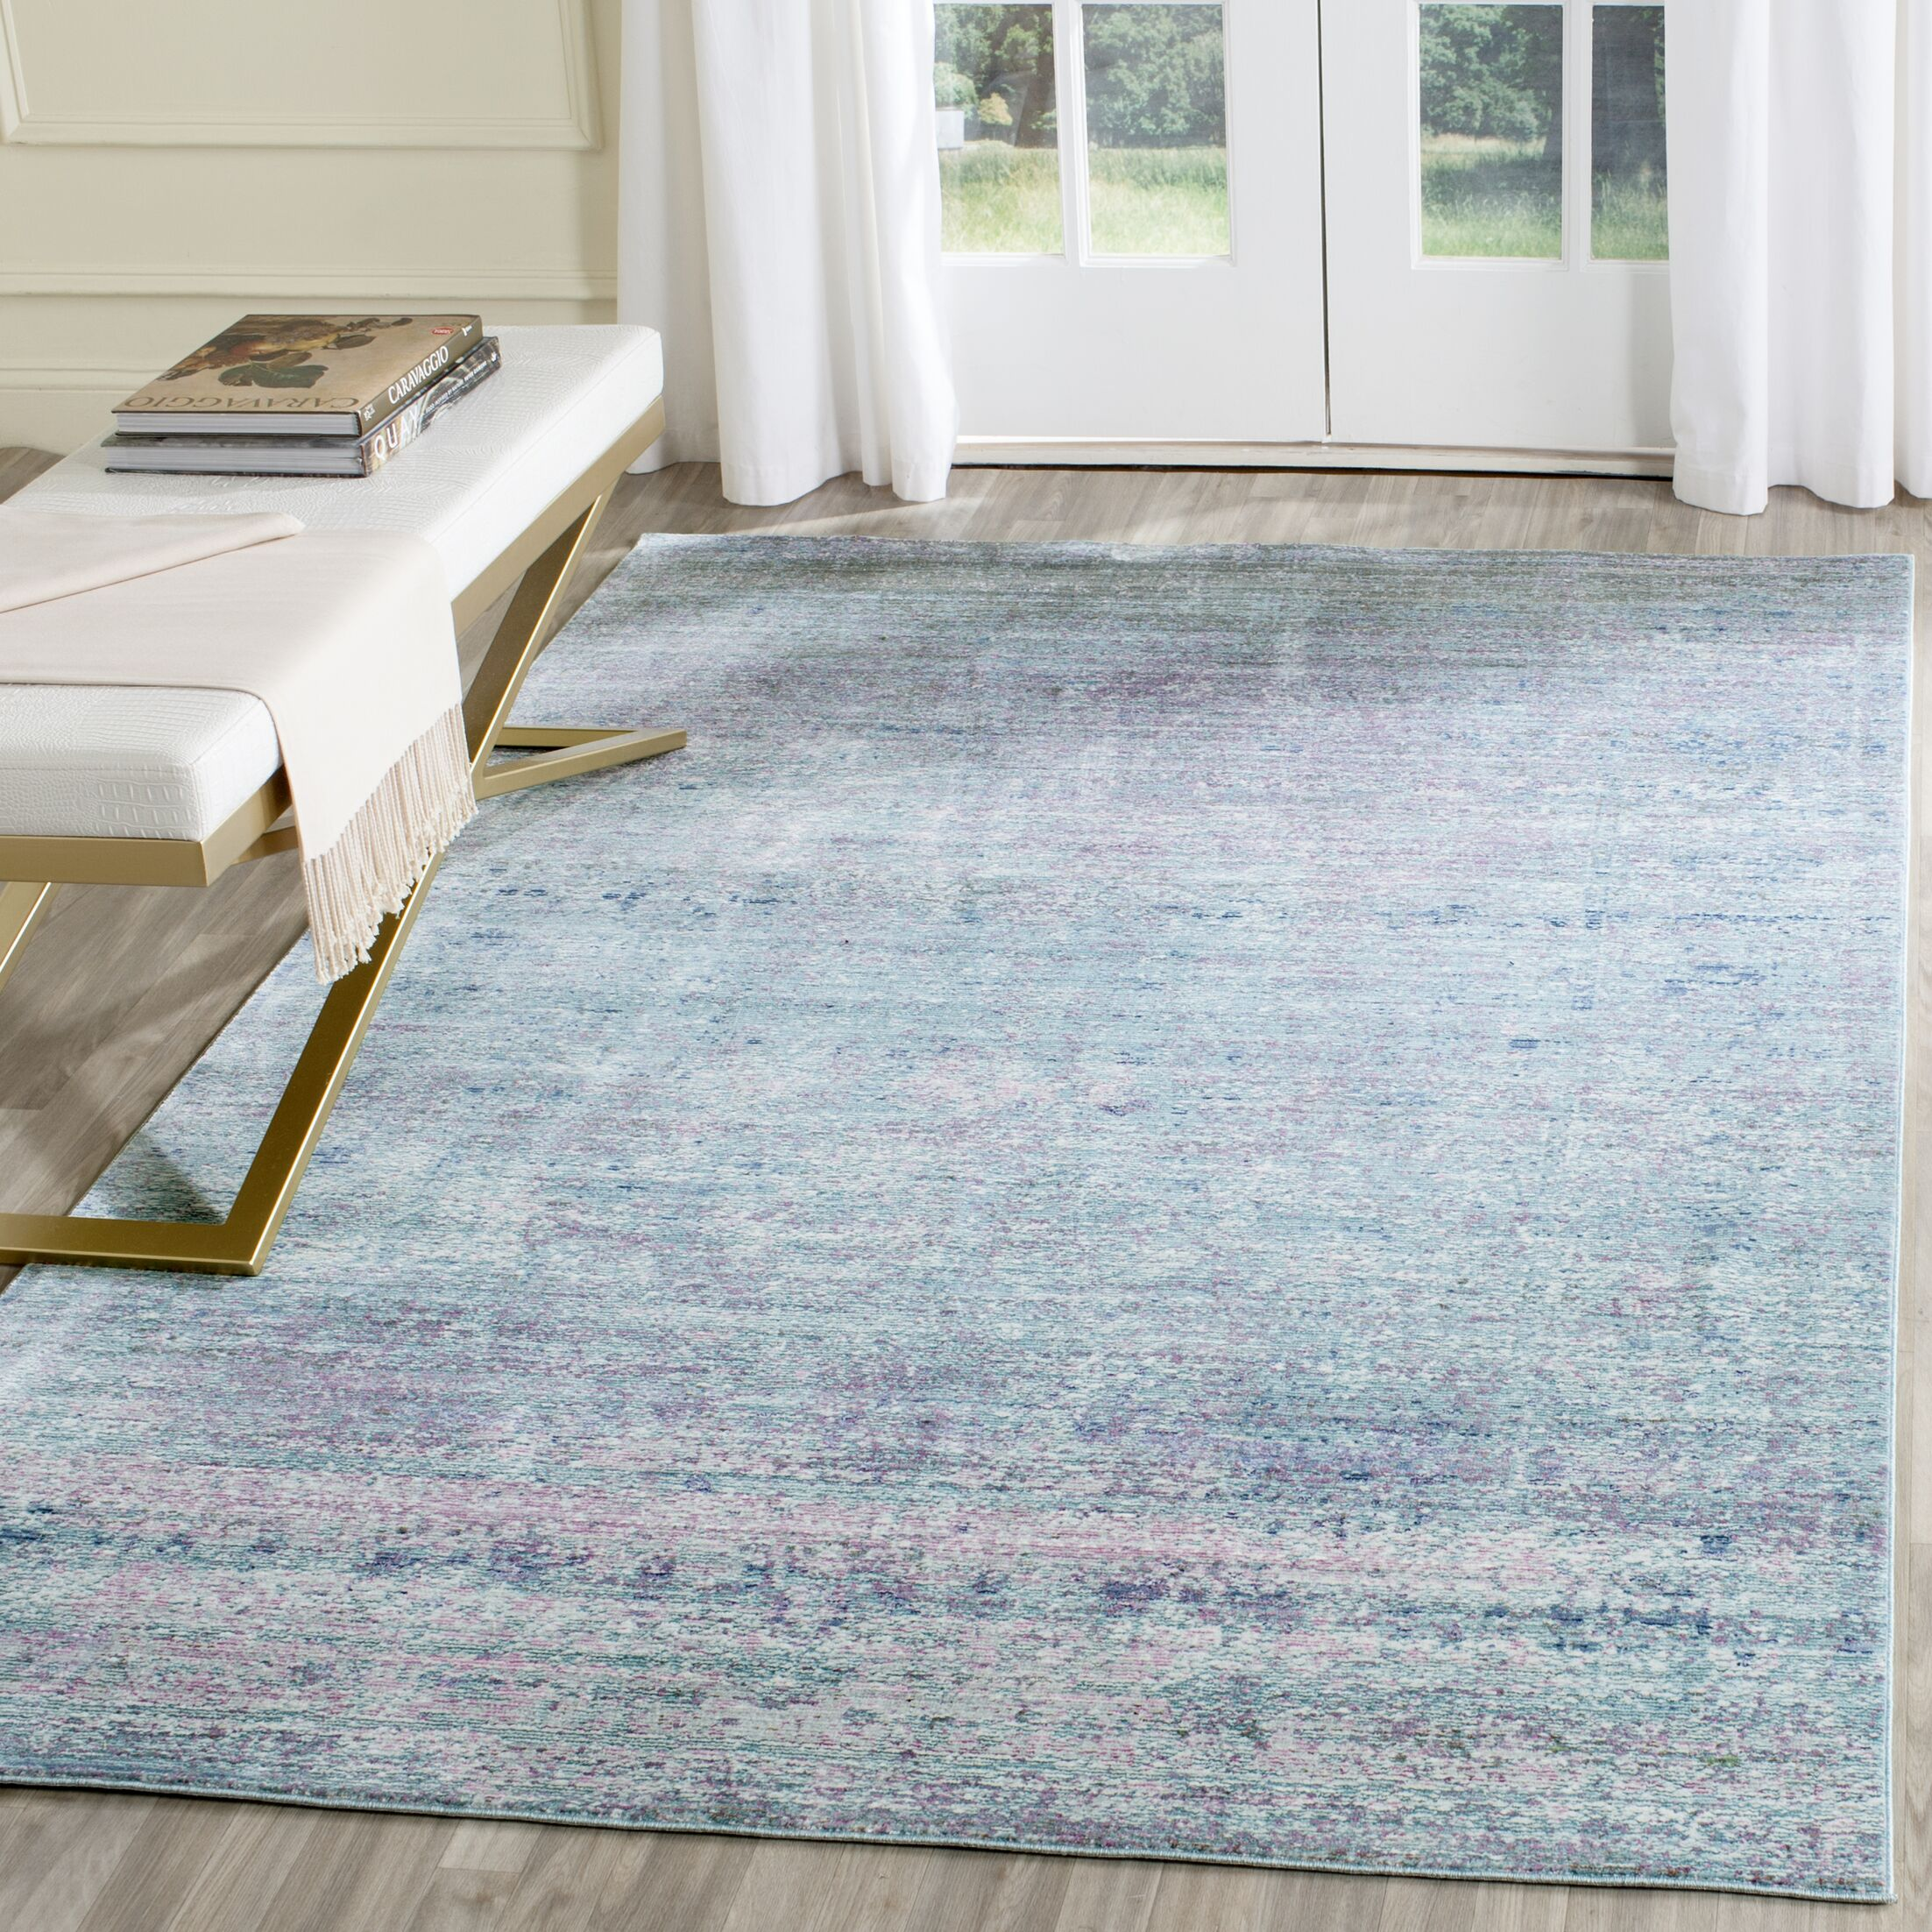 Mulhall Purple/Blue Area Rug Rug Size: Rectangle 4' x 6'